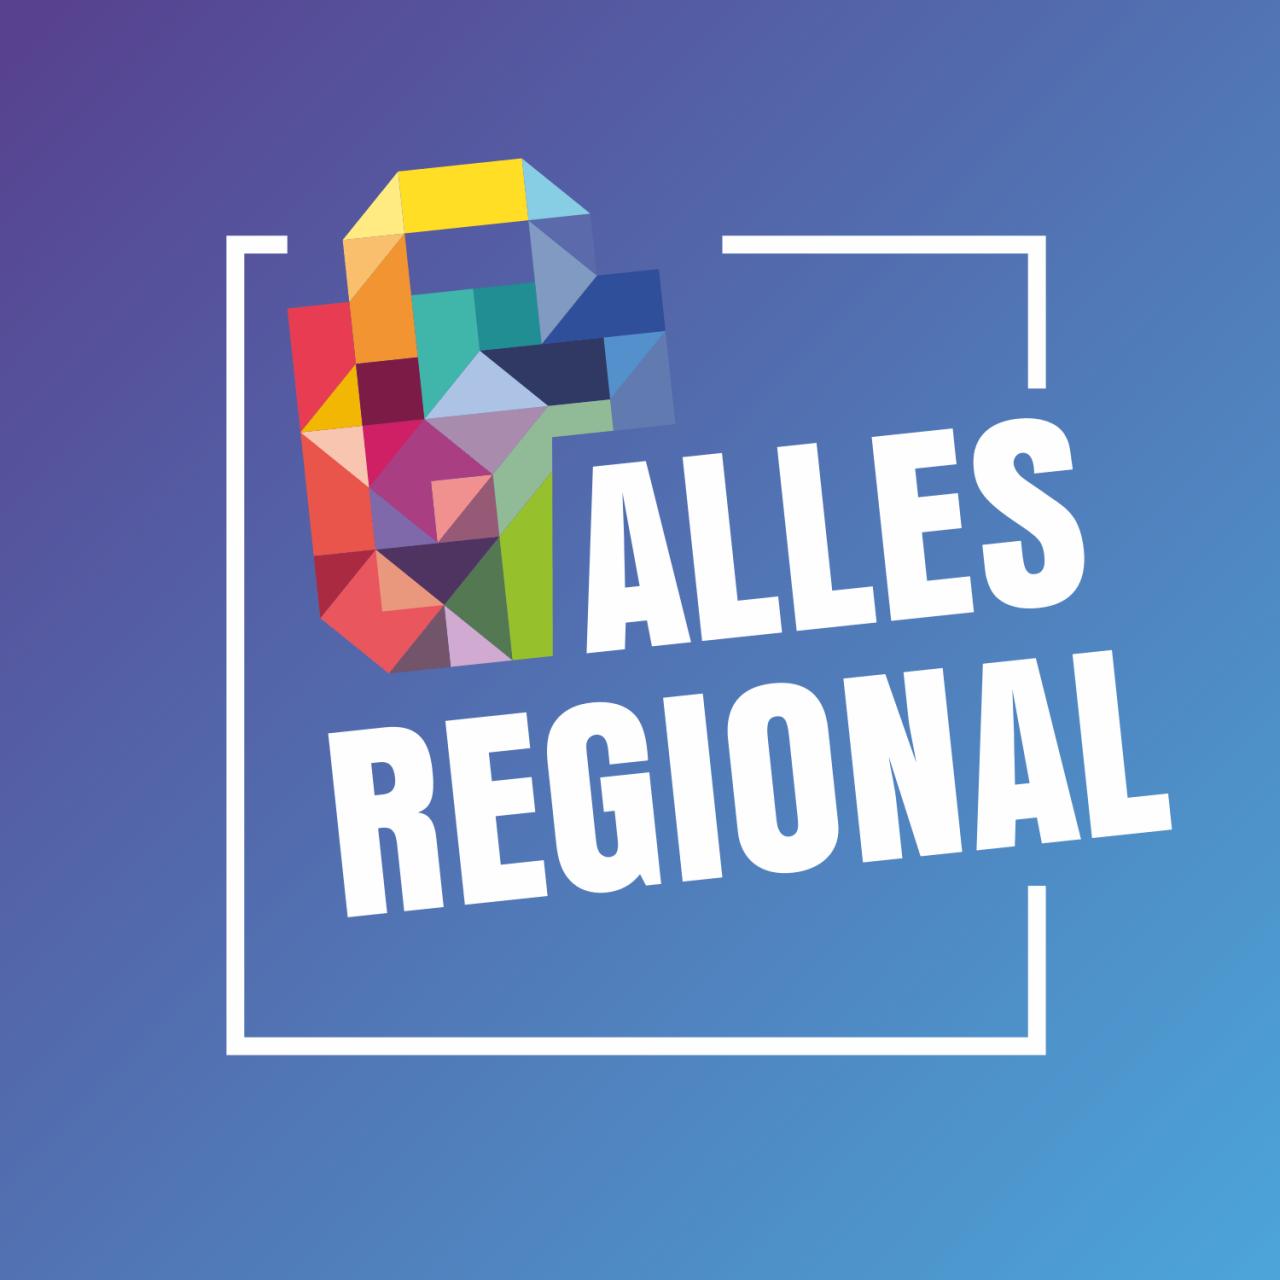 Alles regional